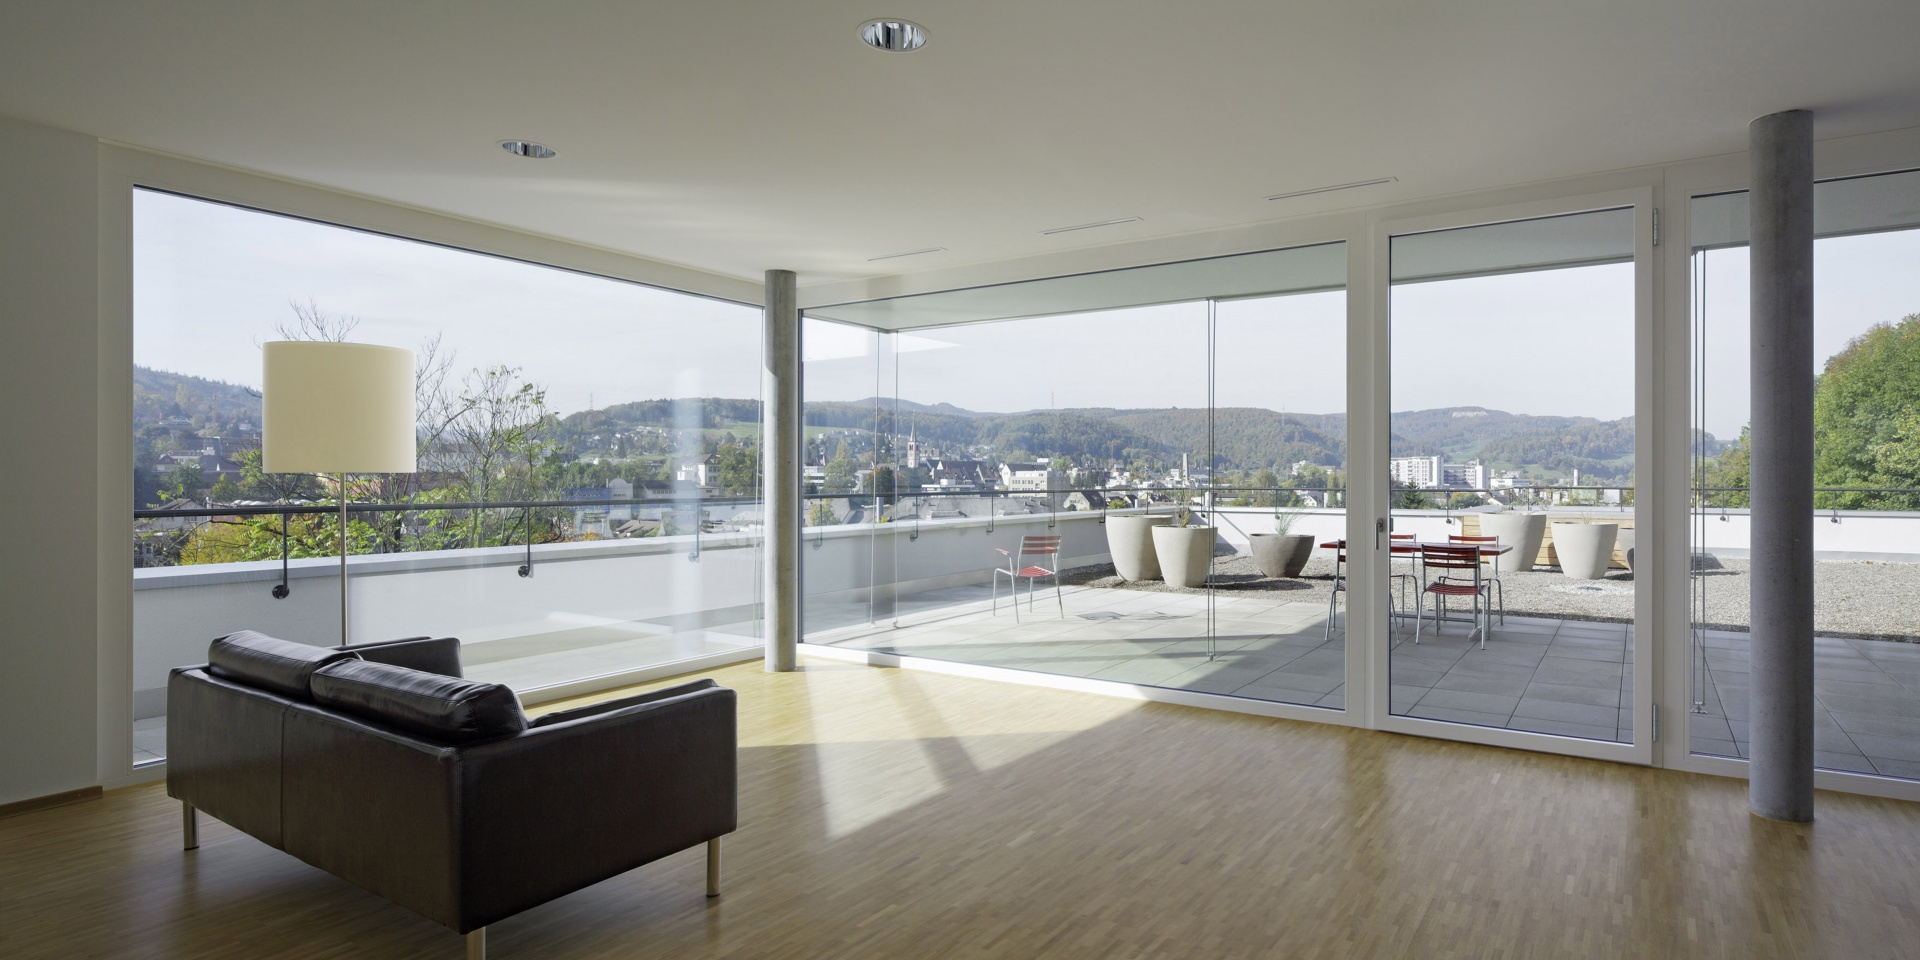 Brunnmatt_Personalaufenthaltsraum © Tom Bisig, Basel